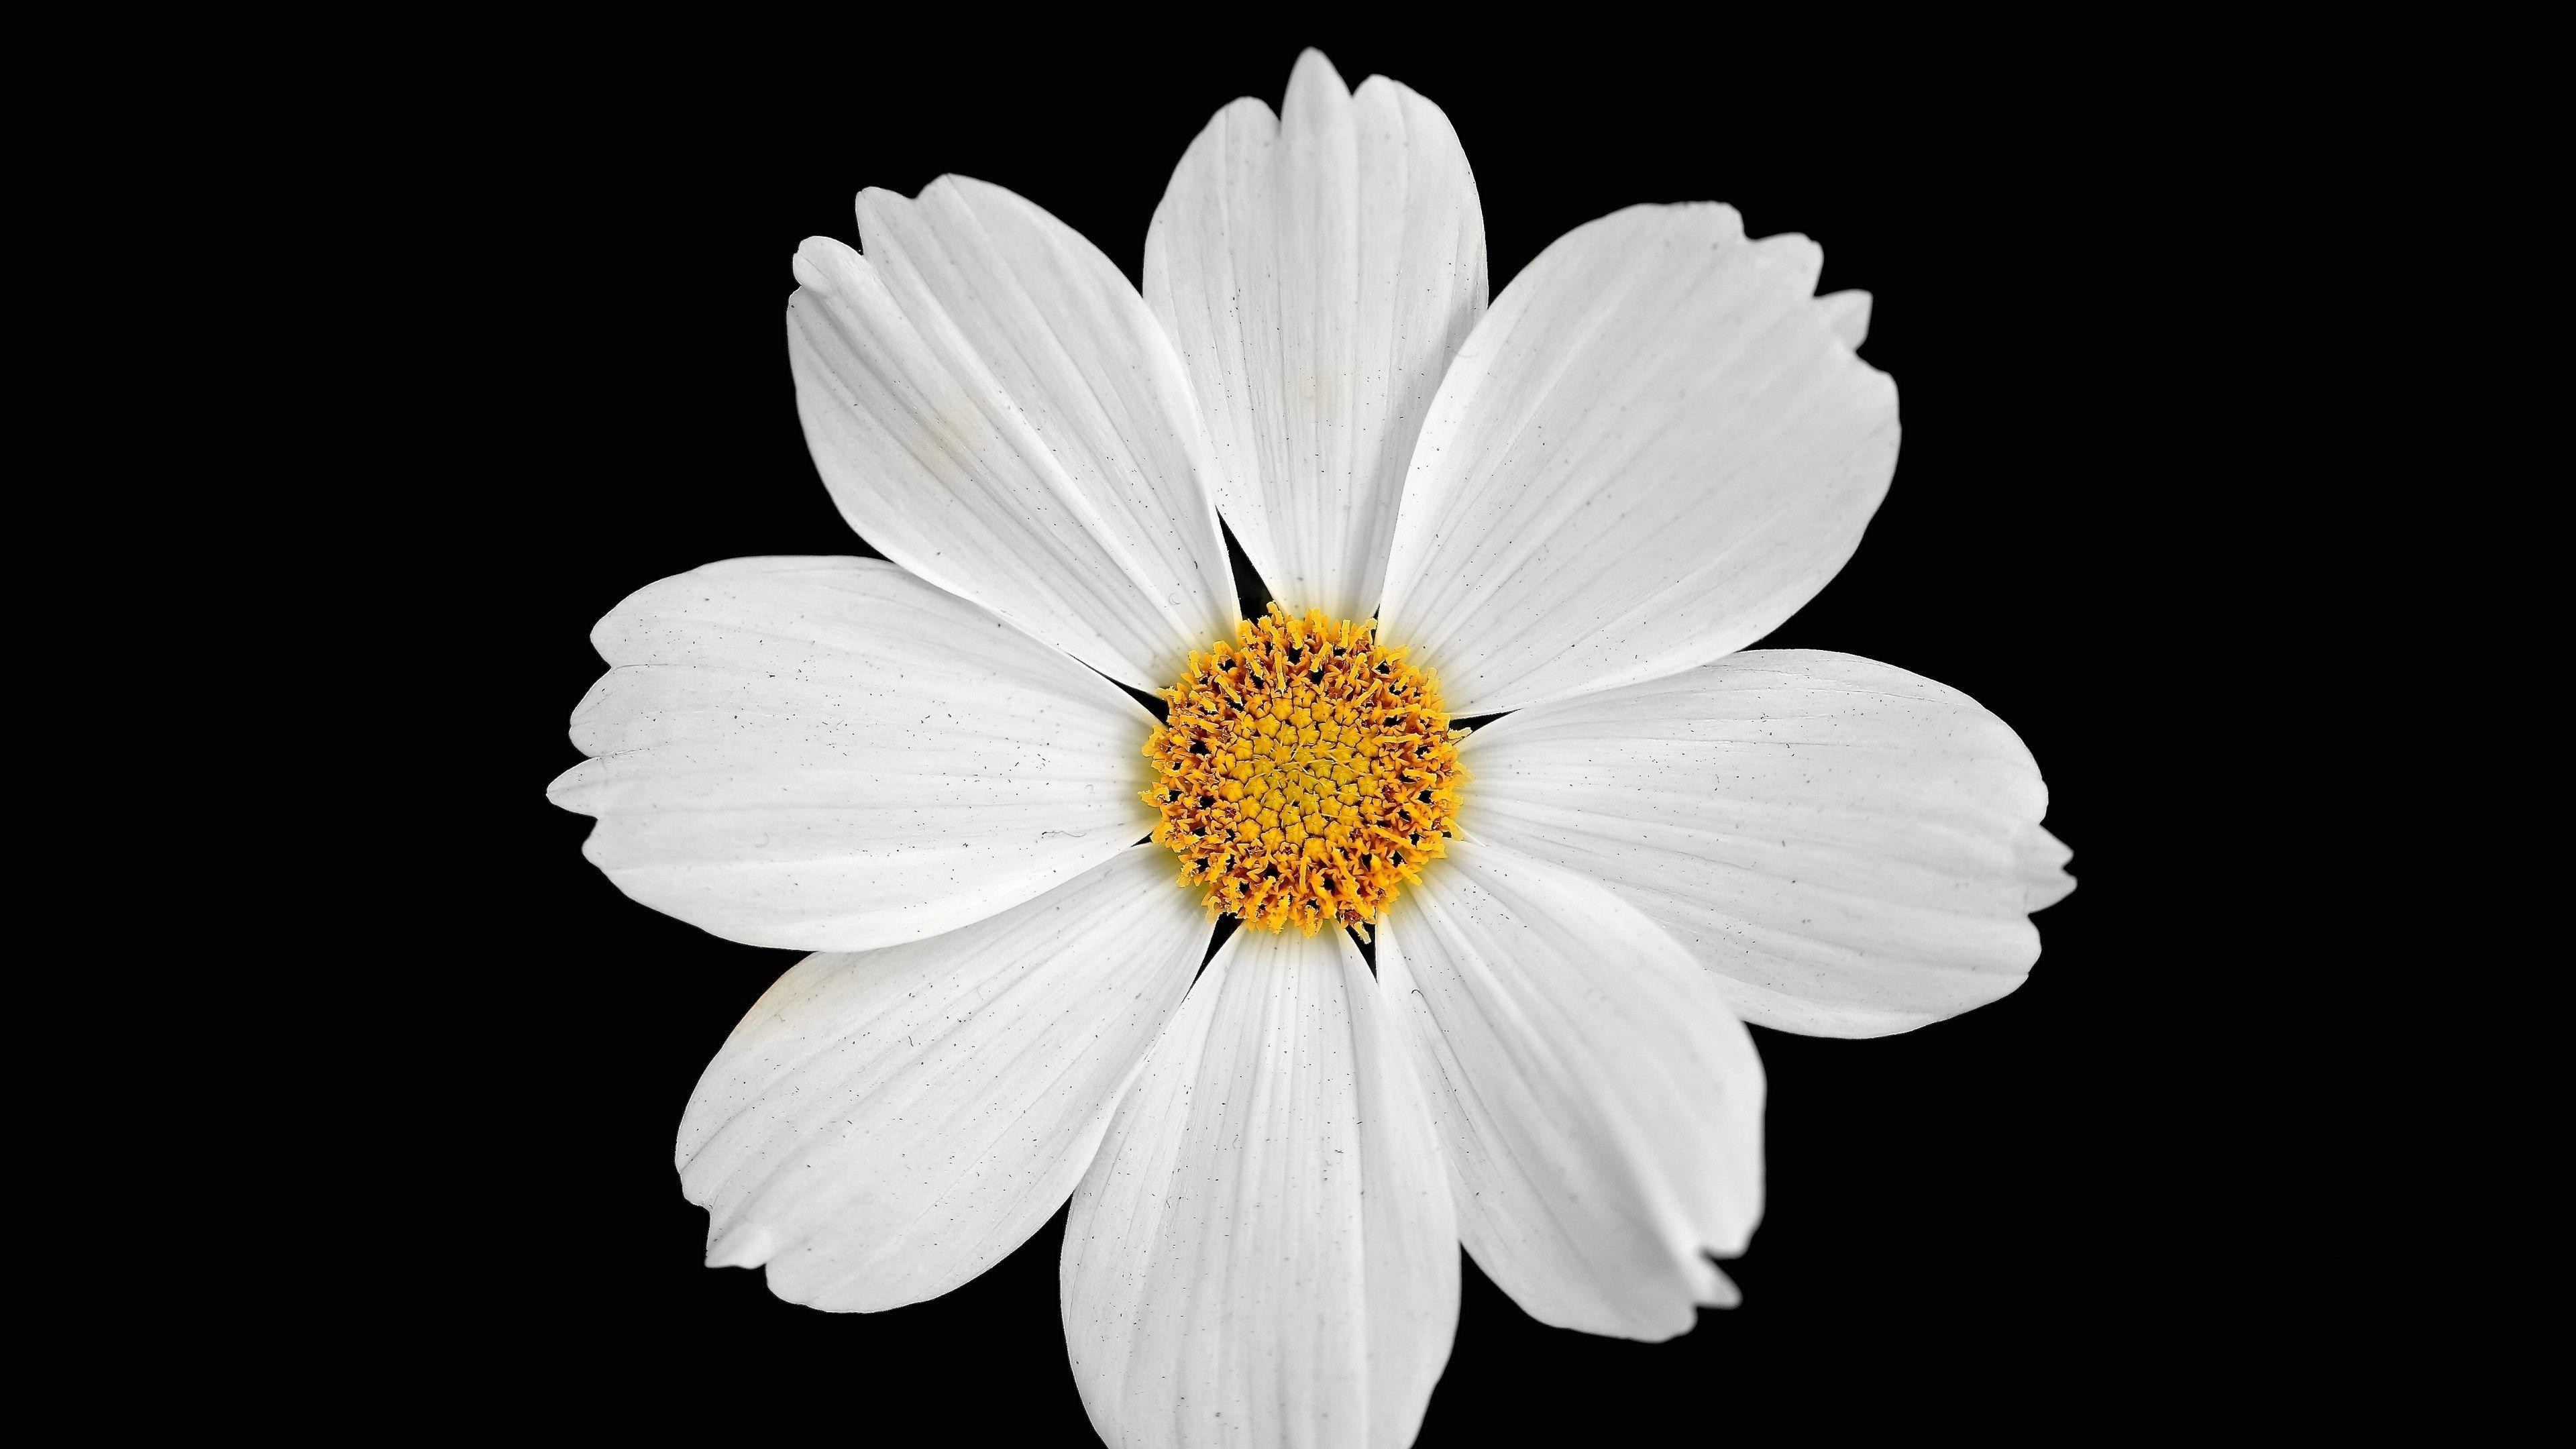 4k hd image download (3840x2160) Geometric nature, White